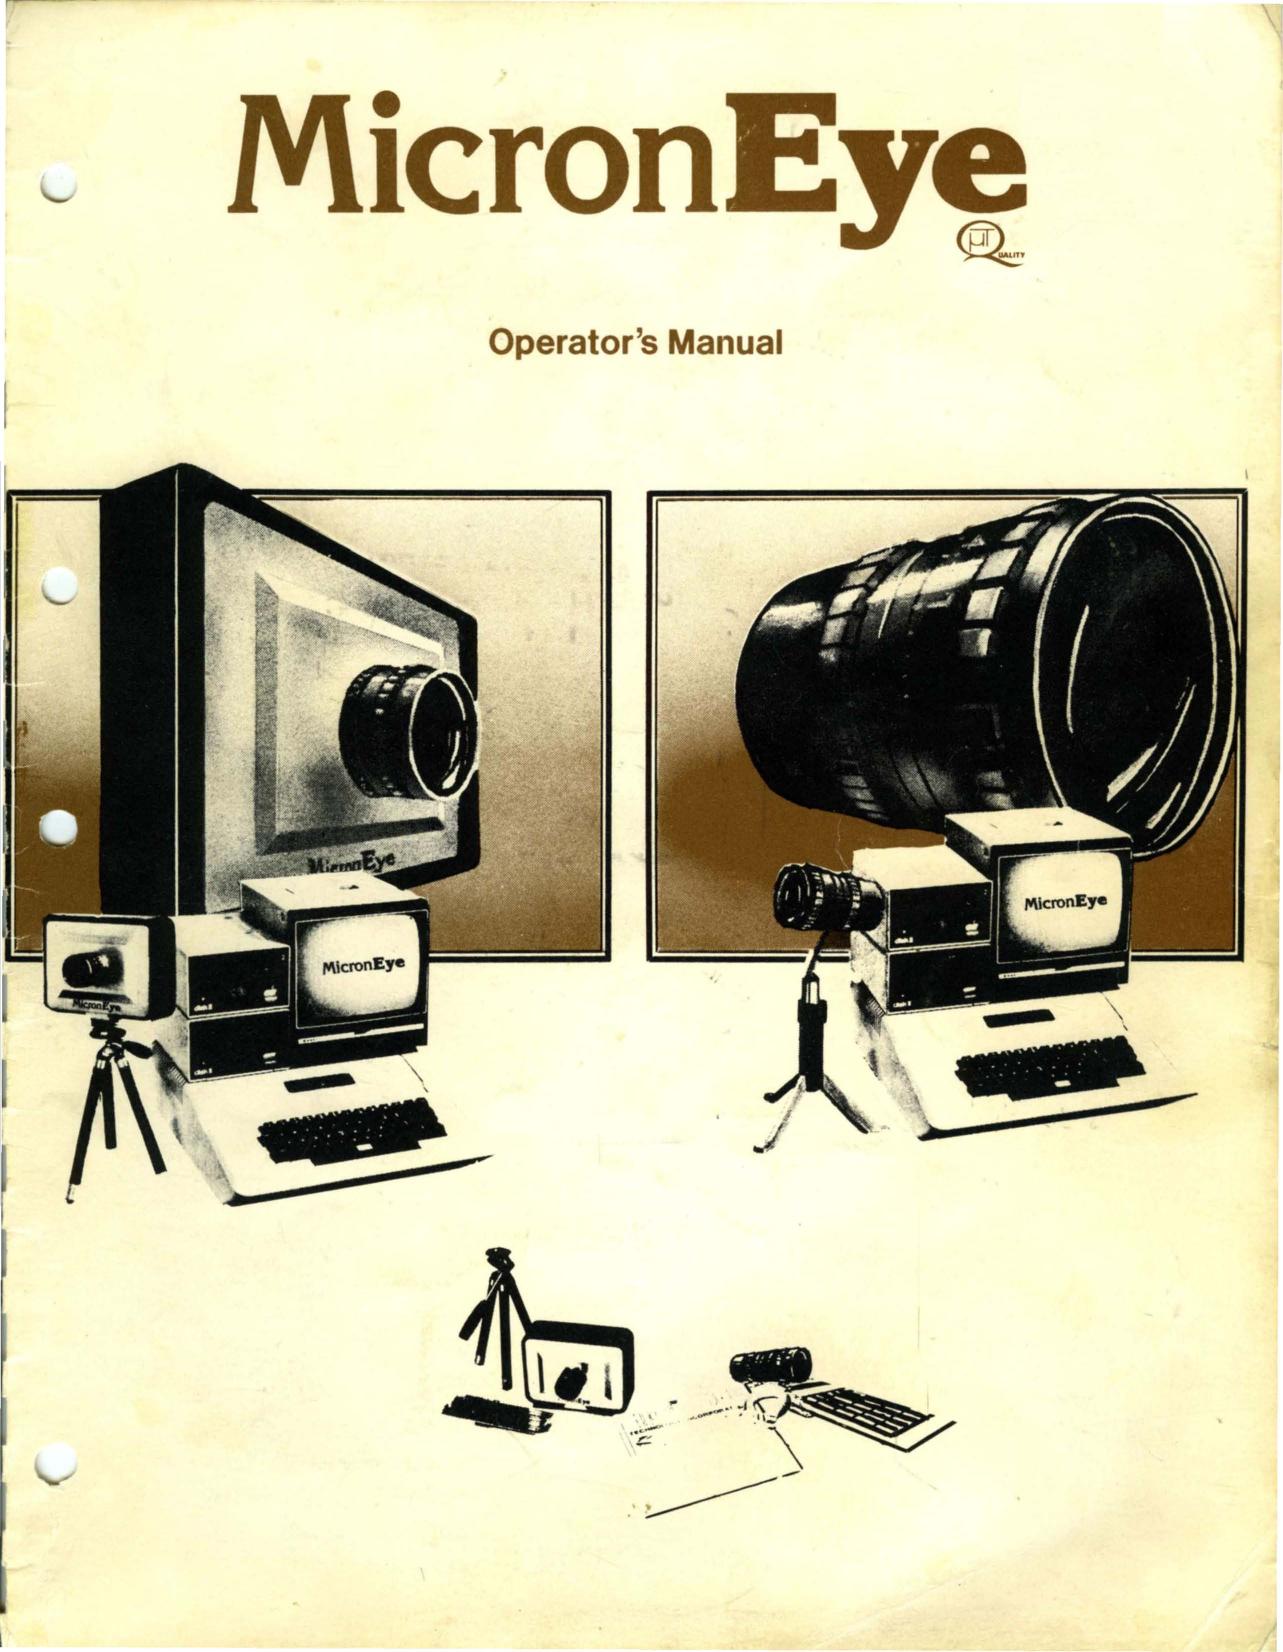 MicronEye_Operators_Manual_1983.pdf | Manualzz